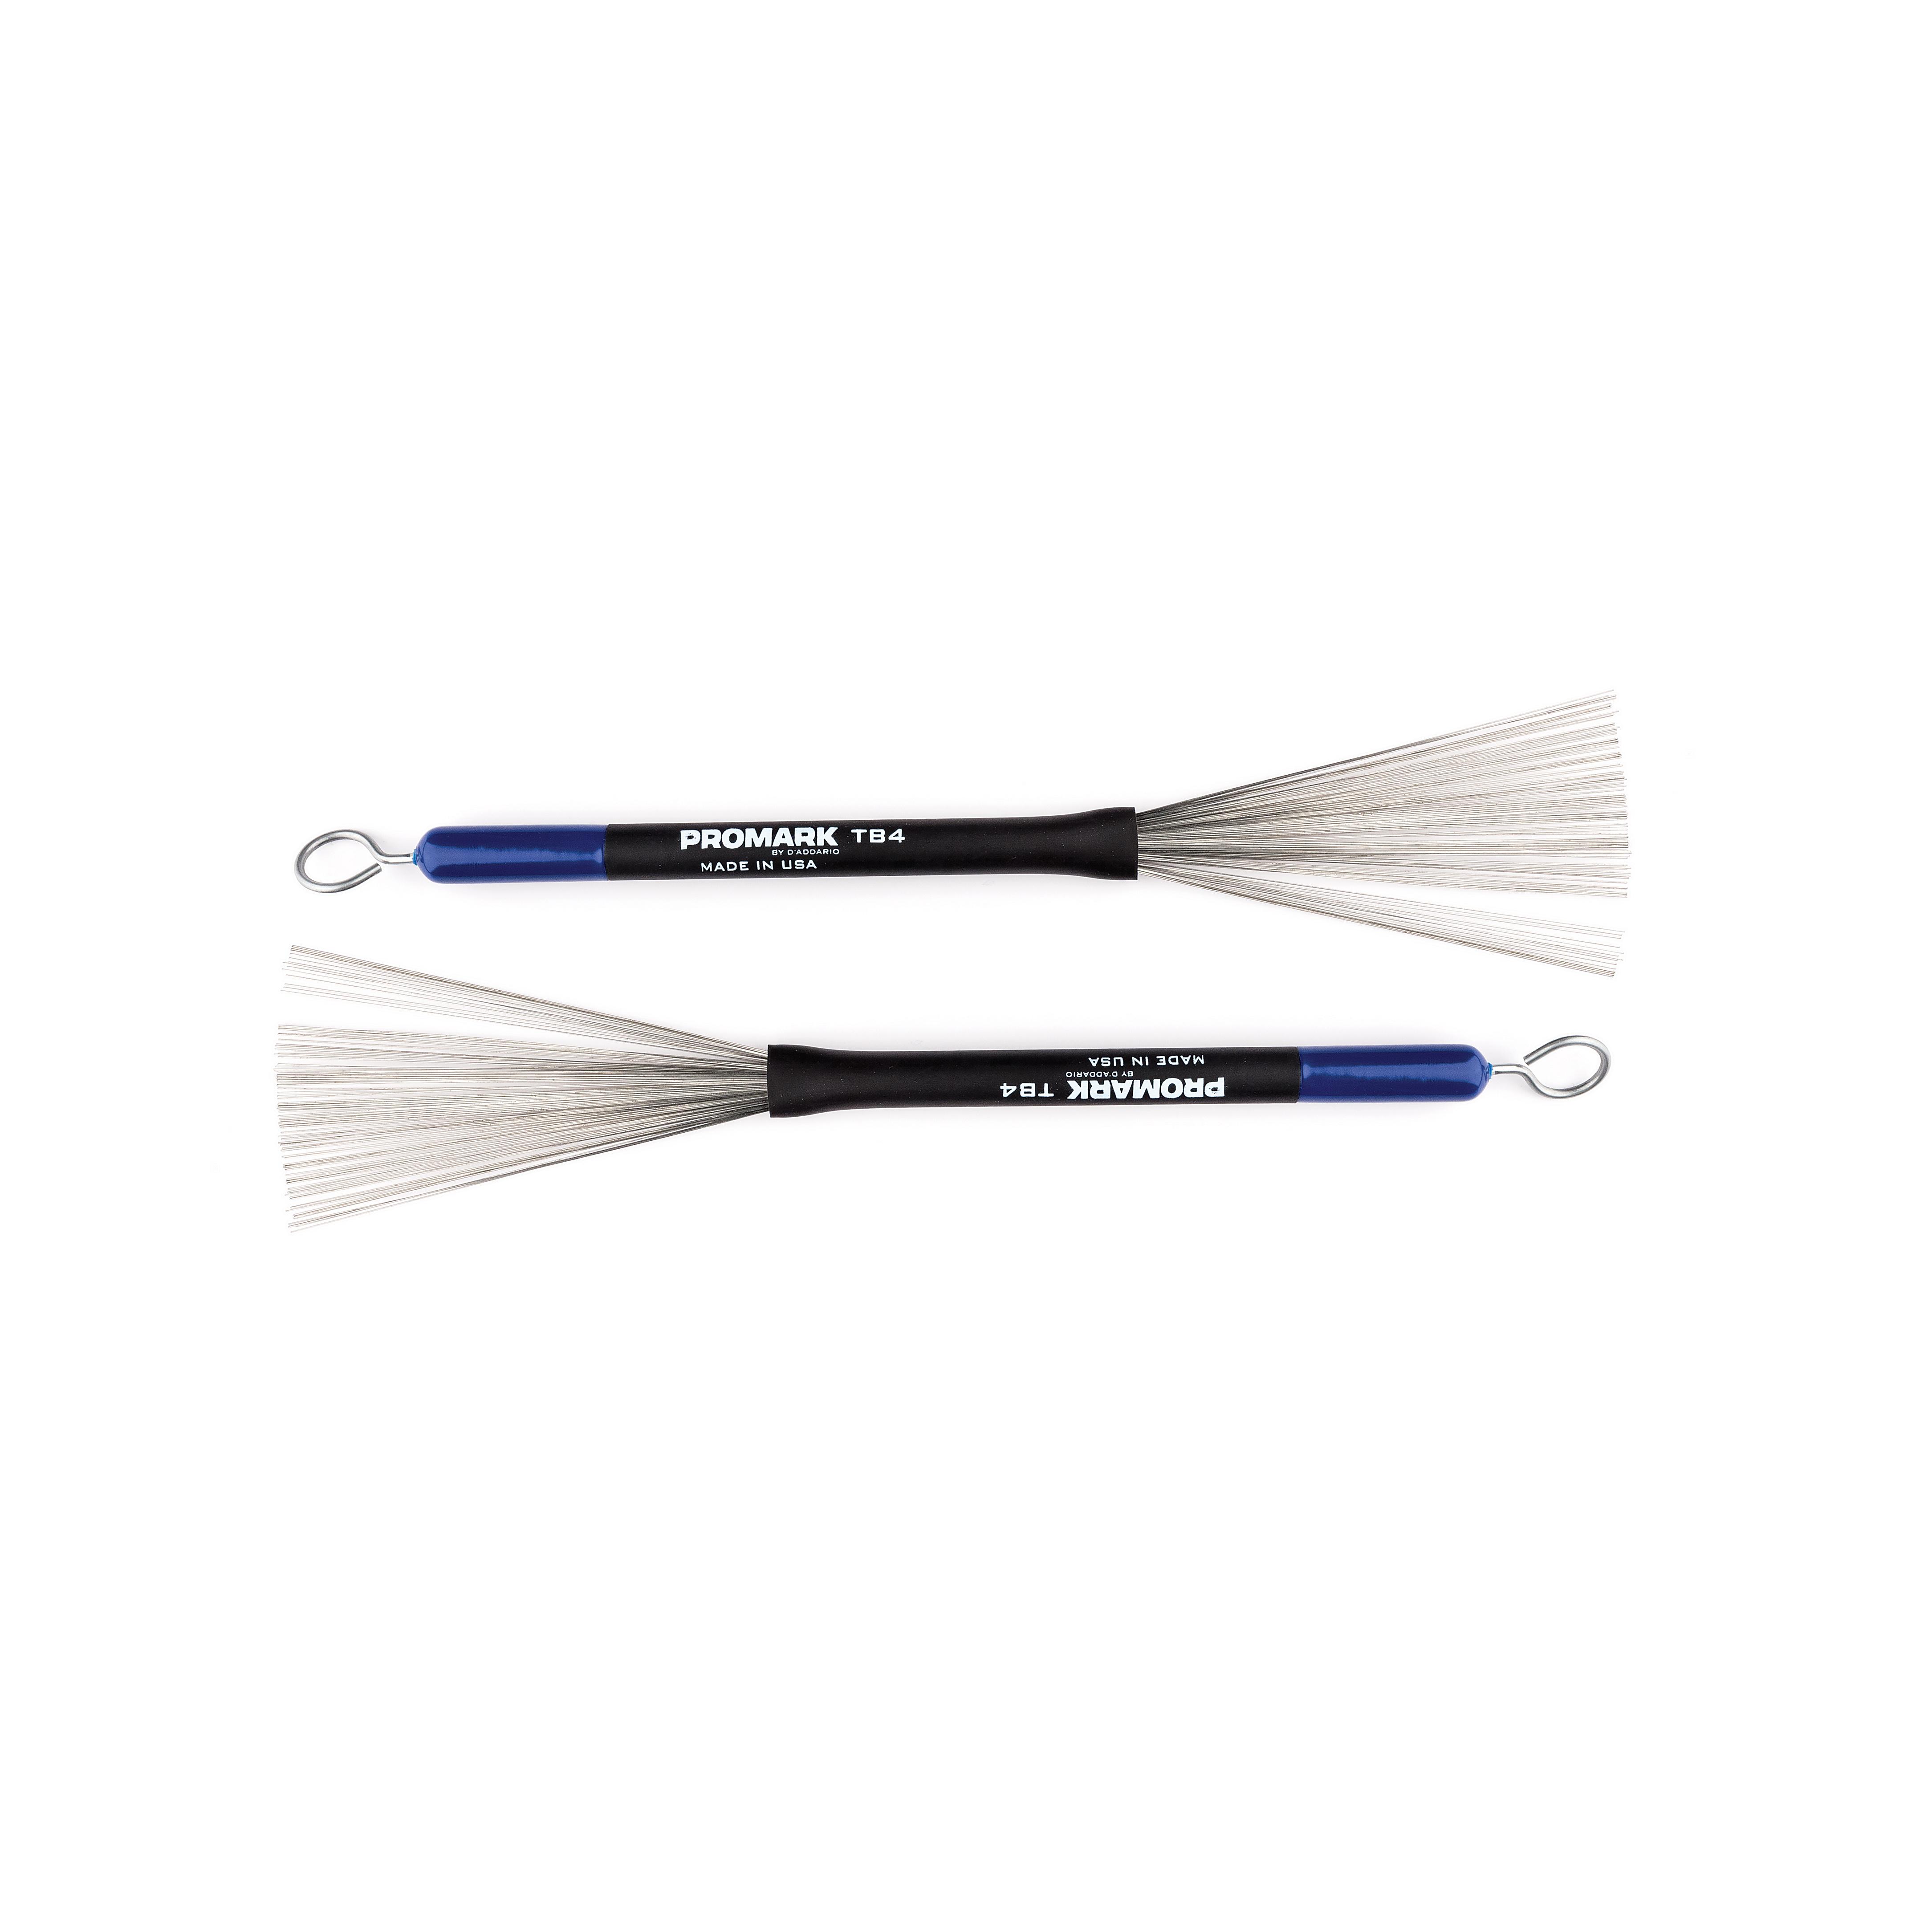 Promark TB4 Classic Telescopic Wire Brush